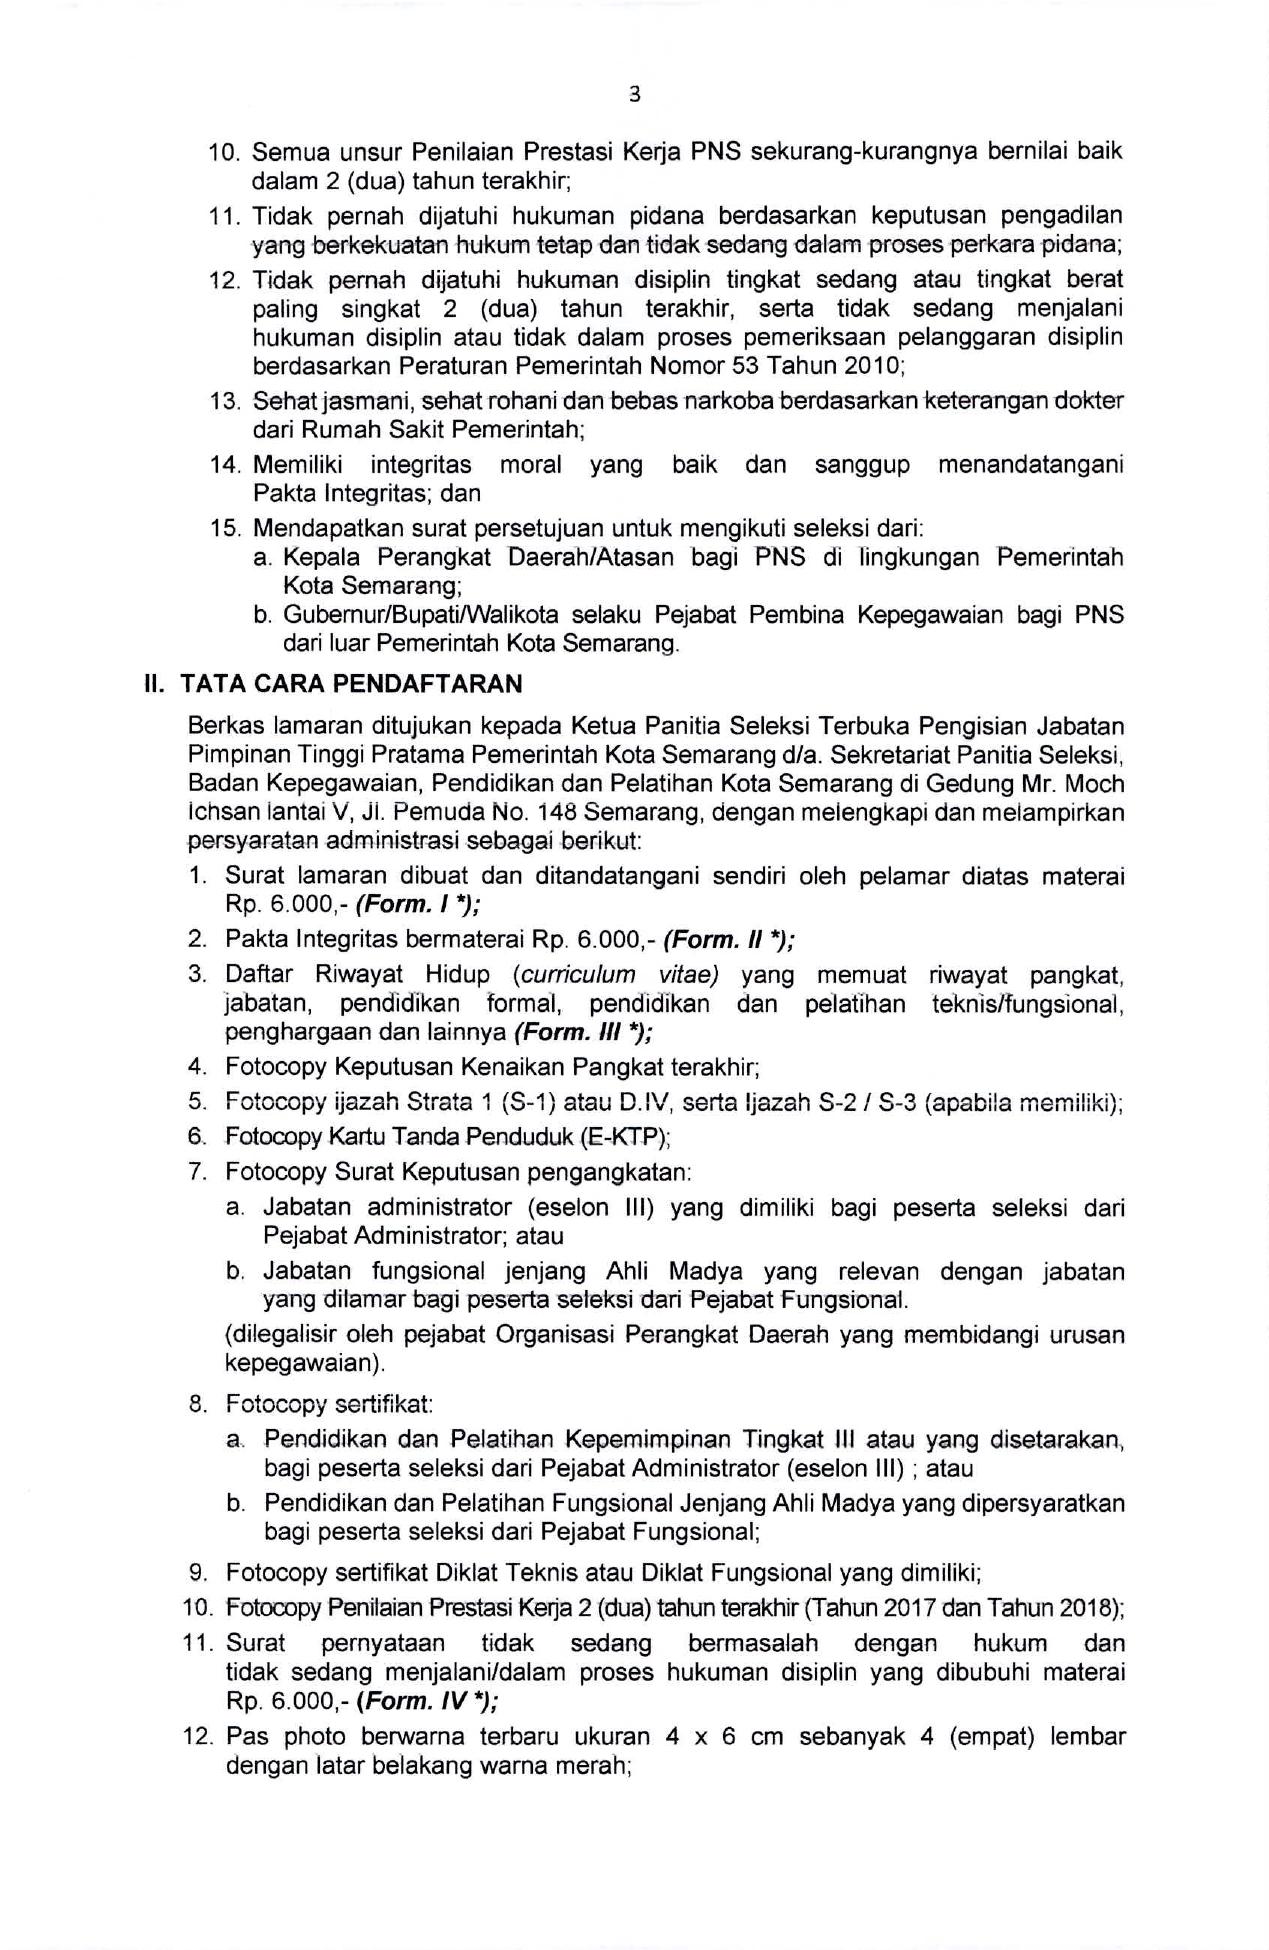 PENGUMUMAN SELEKSI TERBUKA 6 JPT_page-0003.jpg